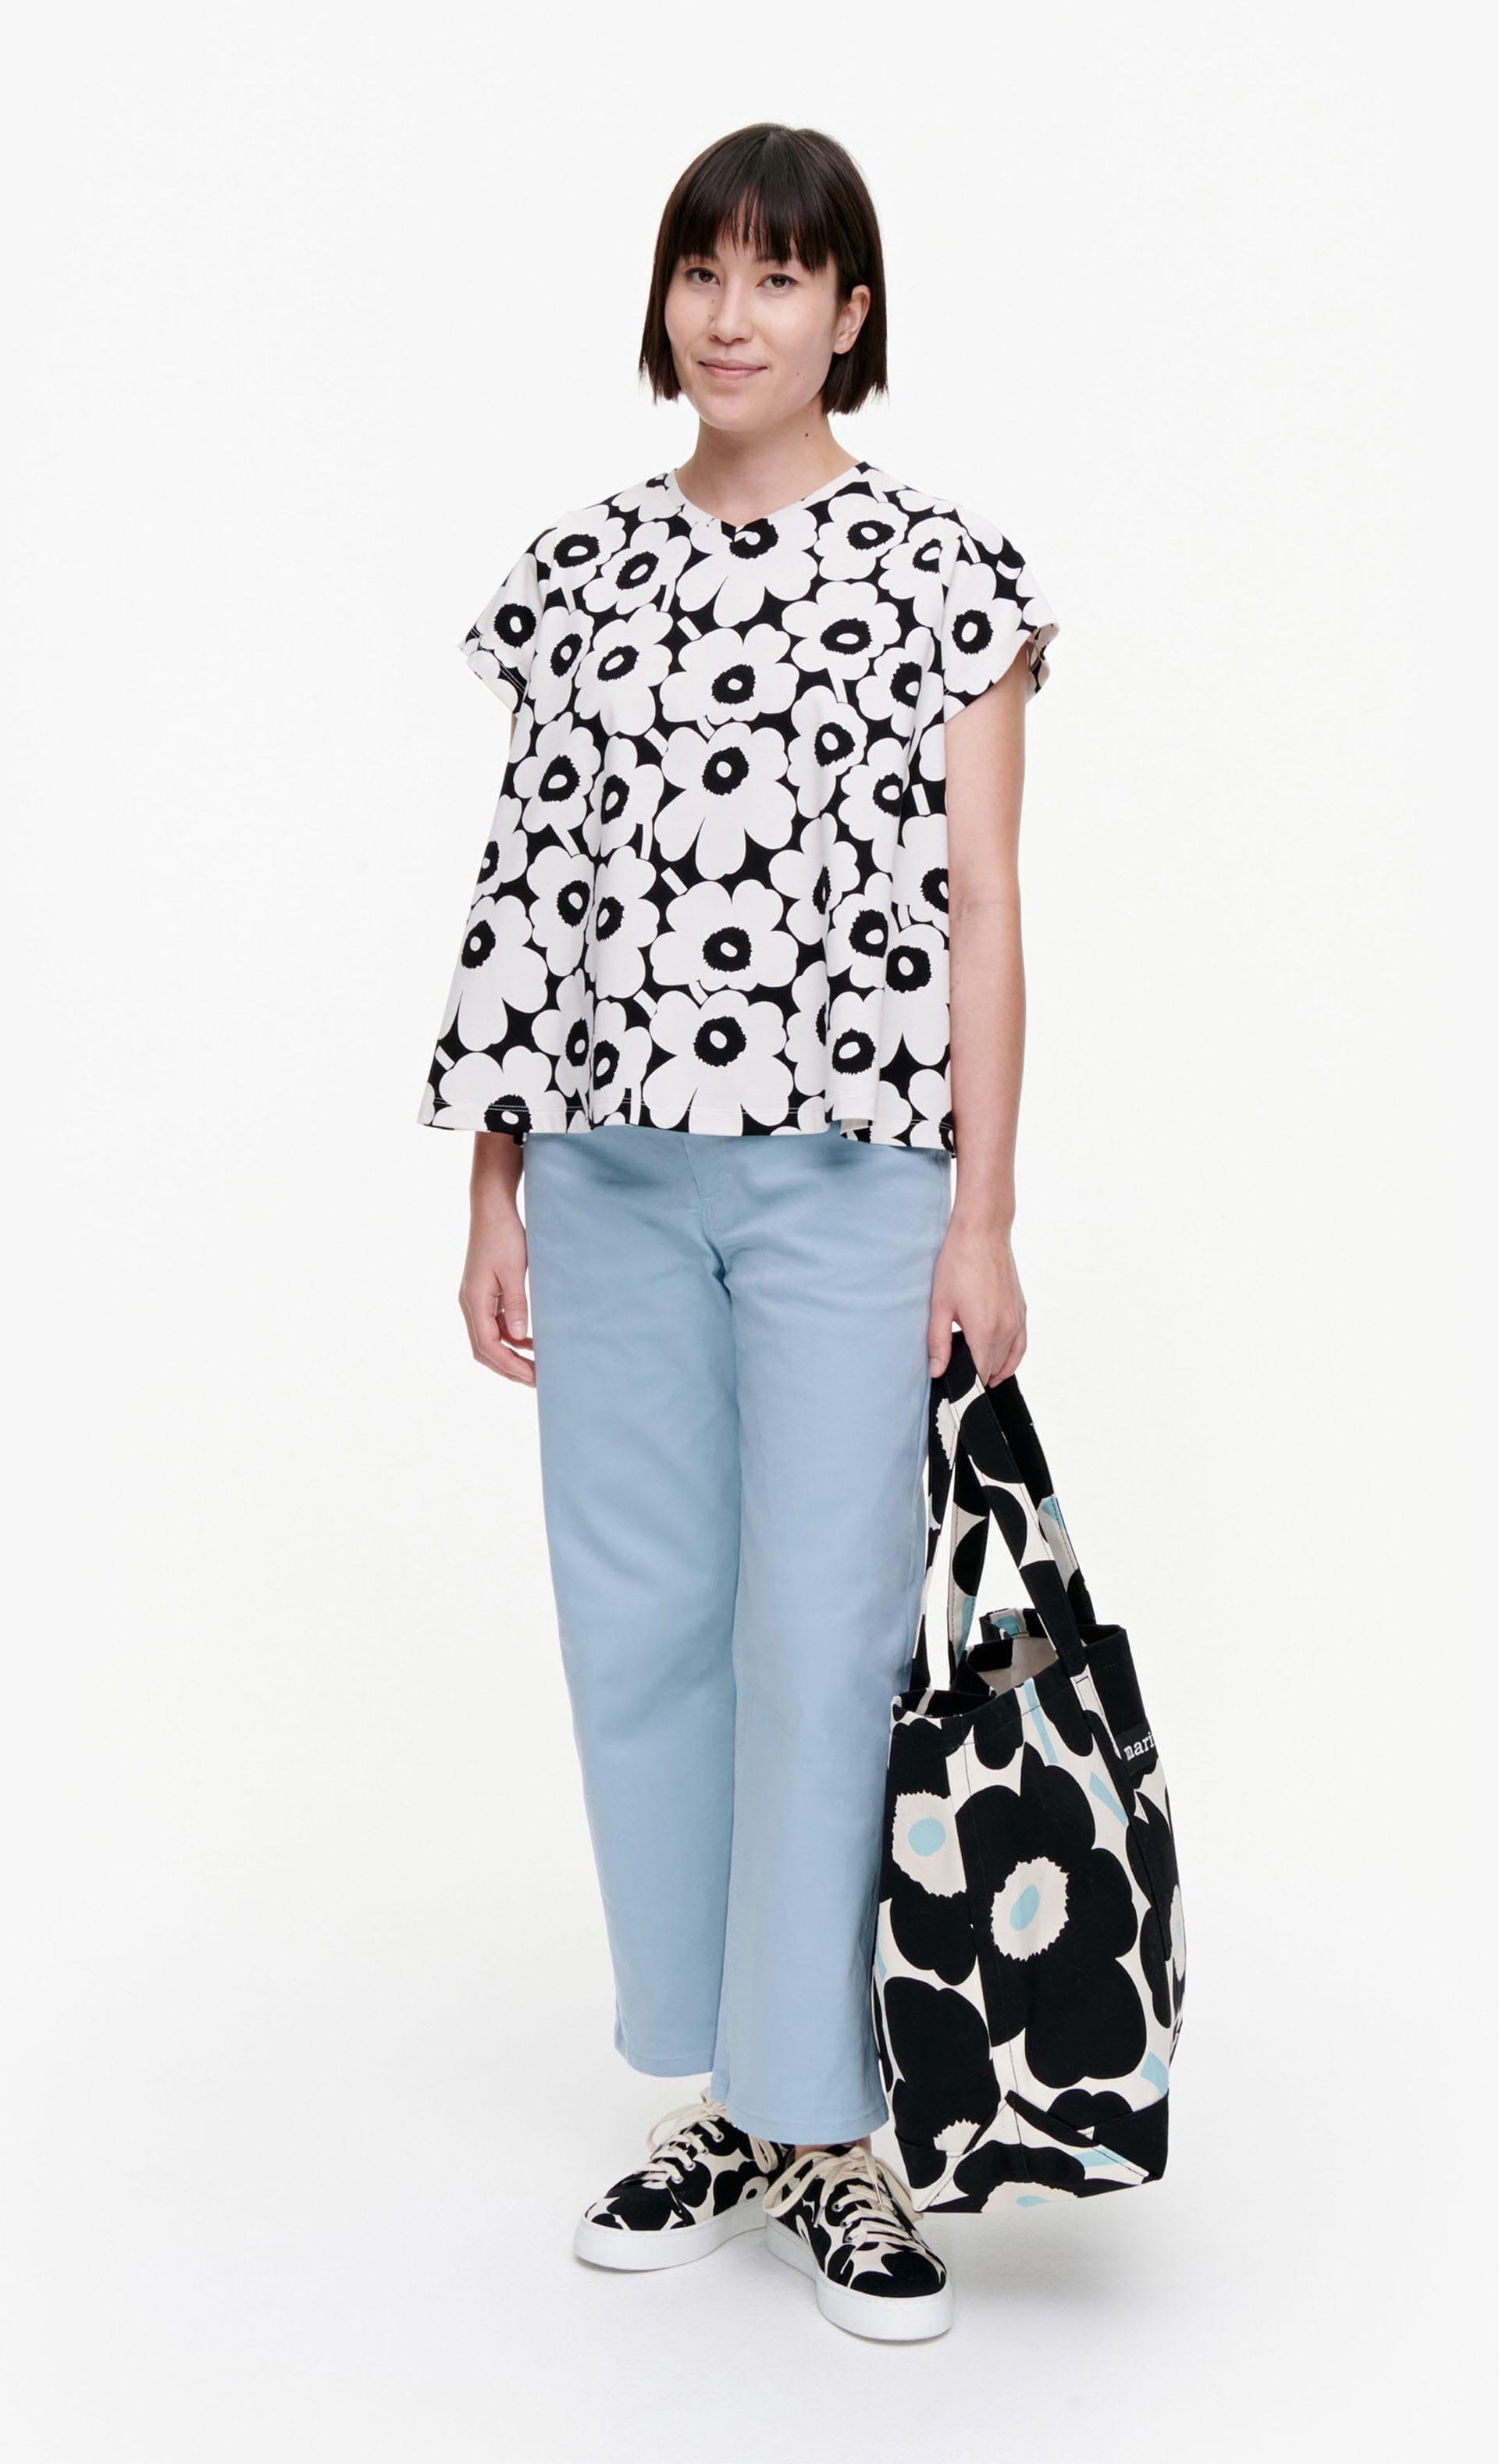 Kevatpiippo Mini Unikko Tシャツ